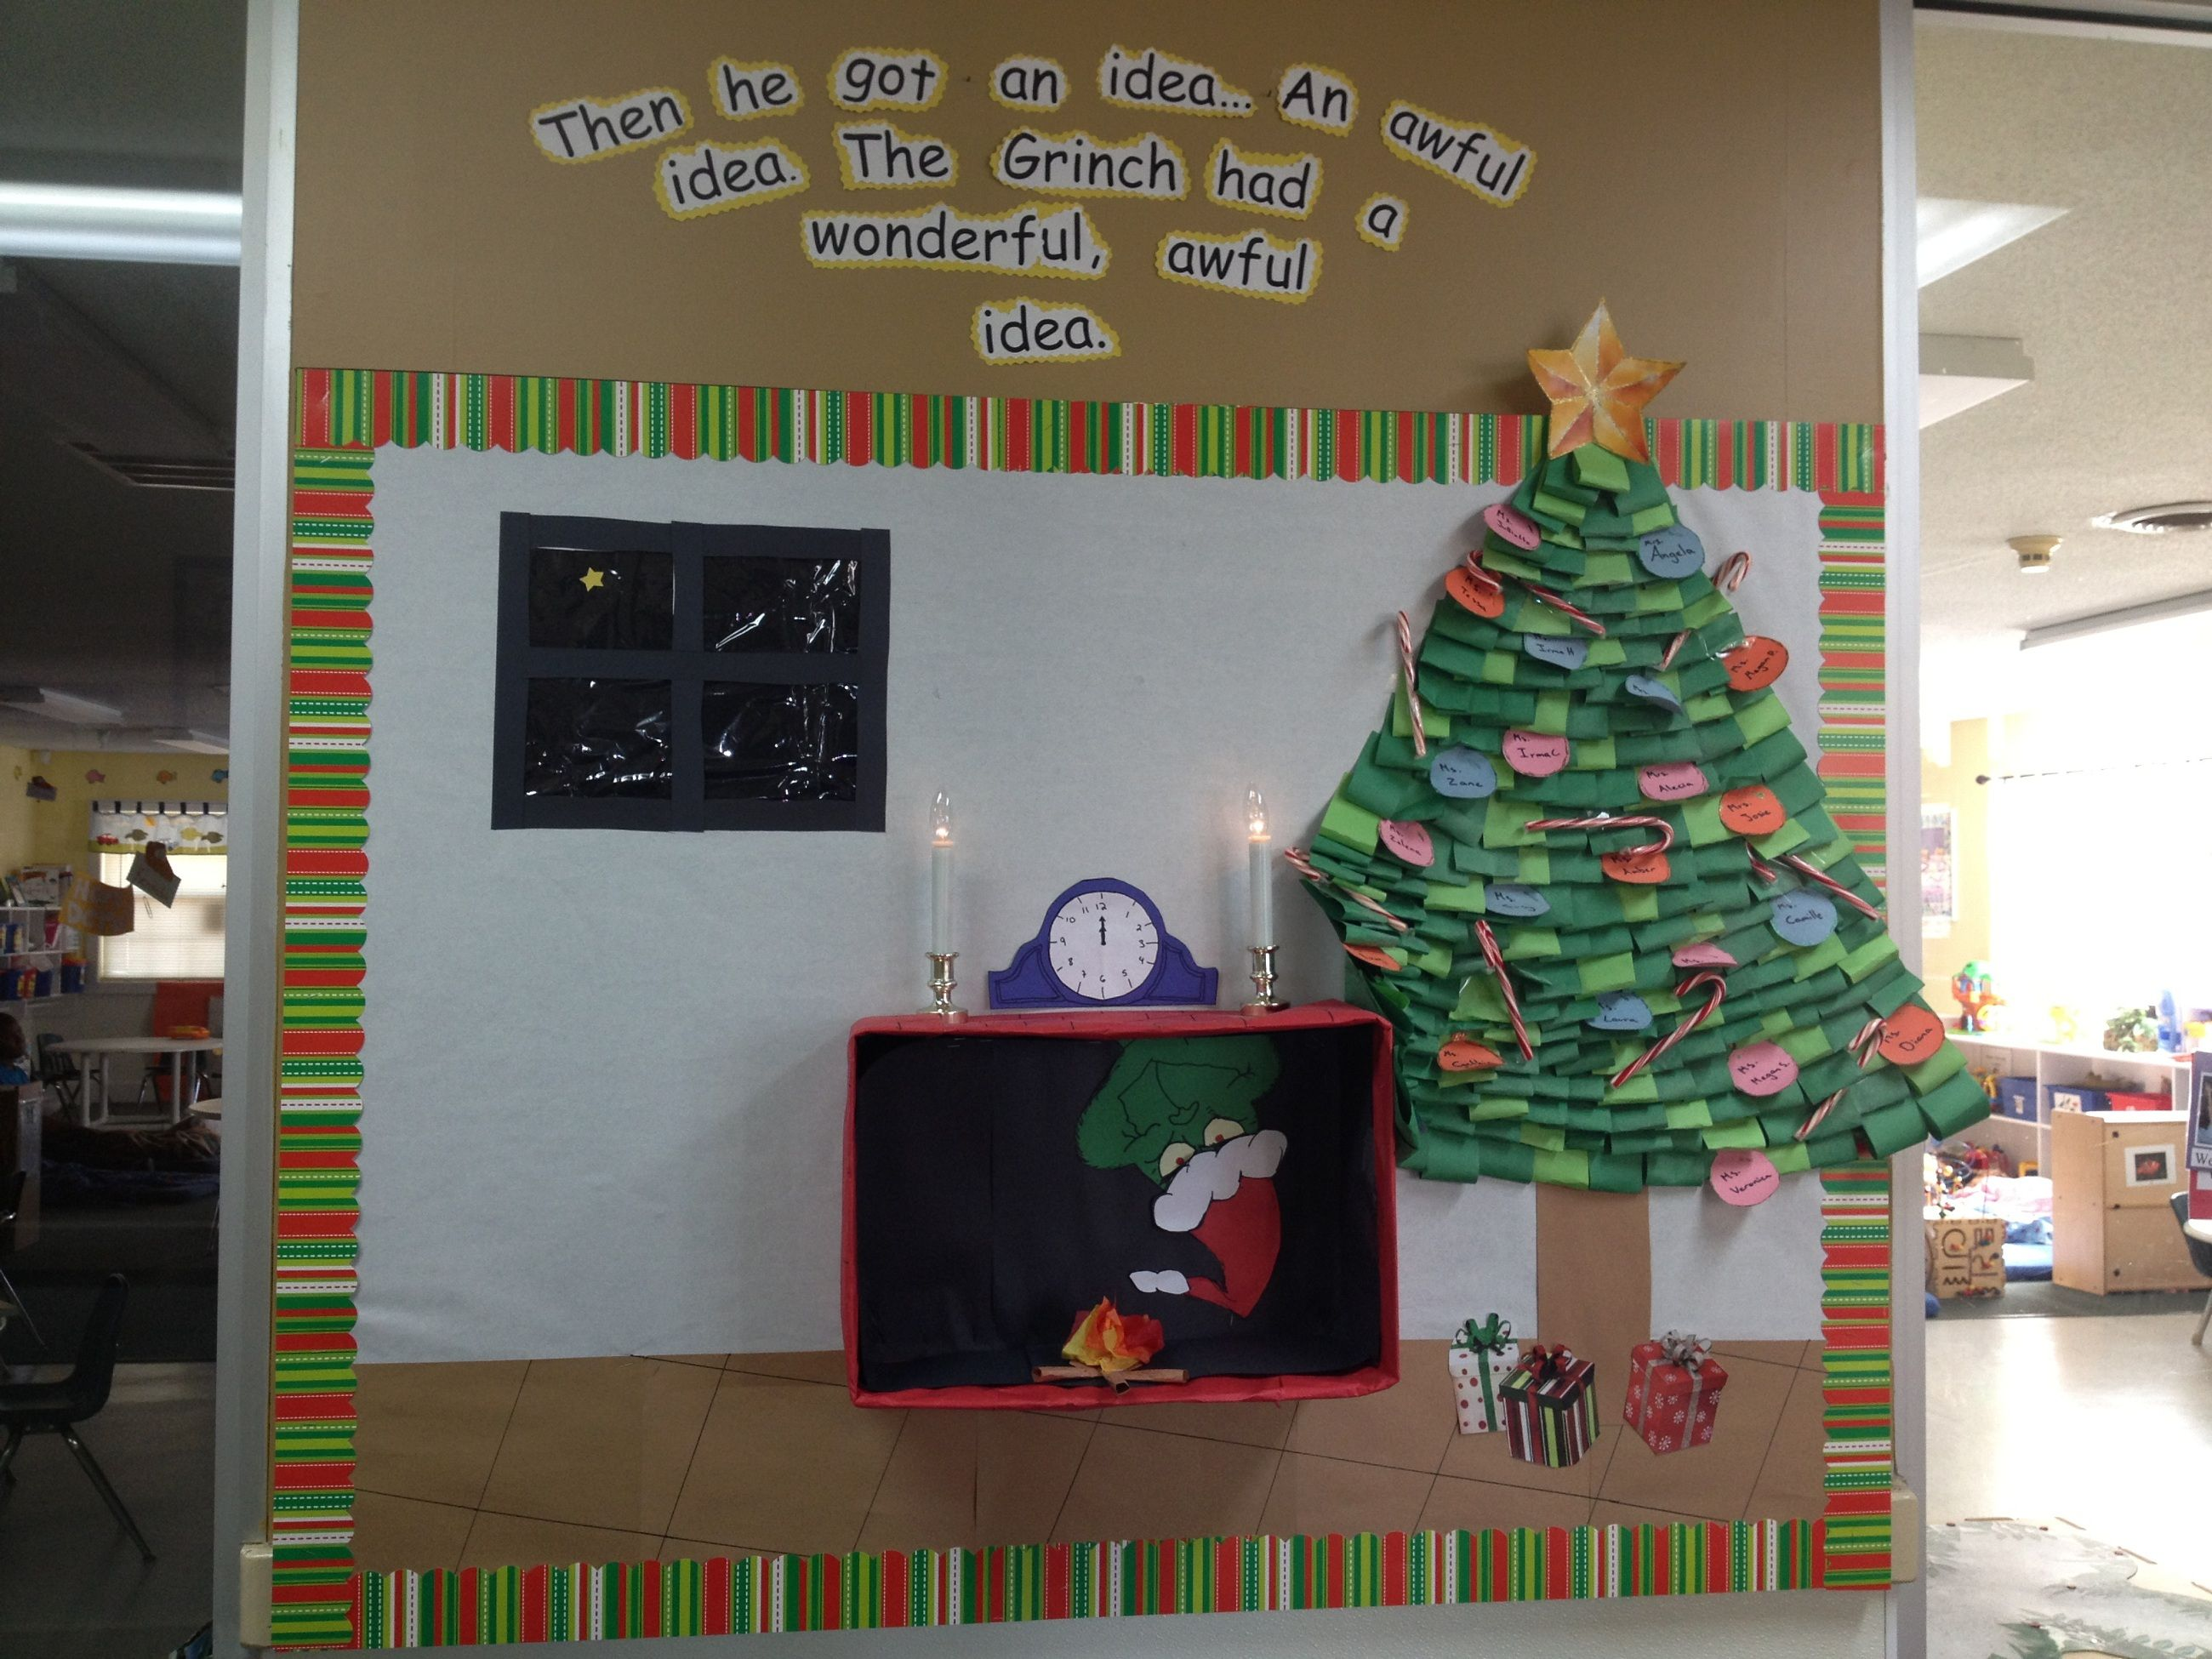 White Christmas Classroom Decorations ~ The grinch had an idea christmas bulletin board